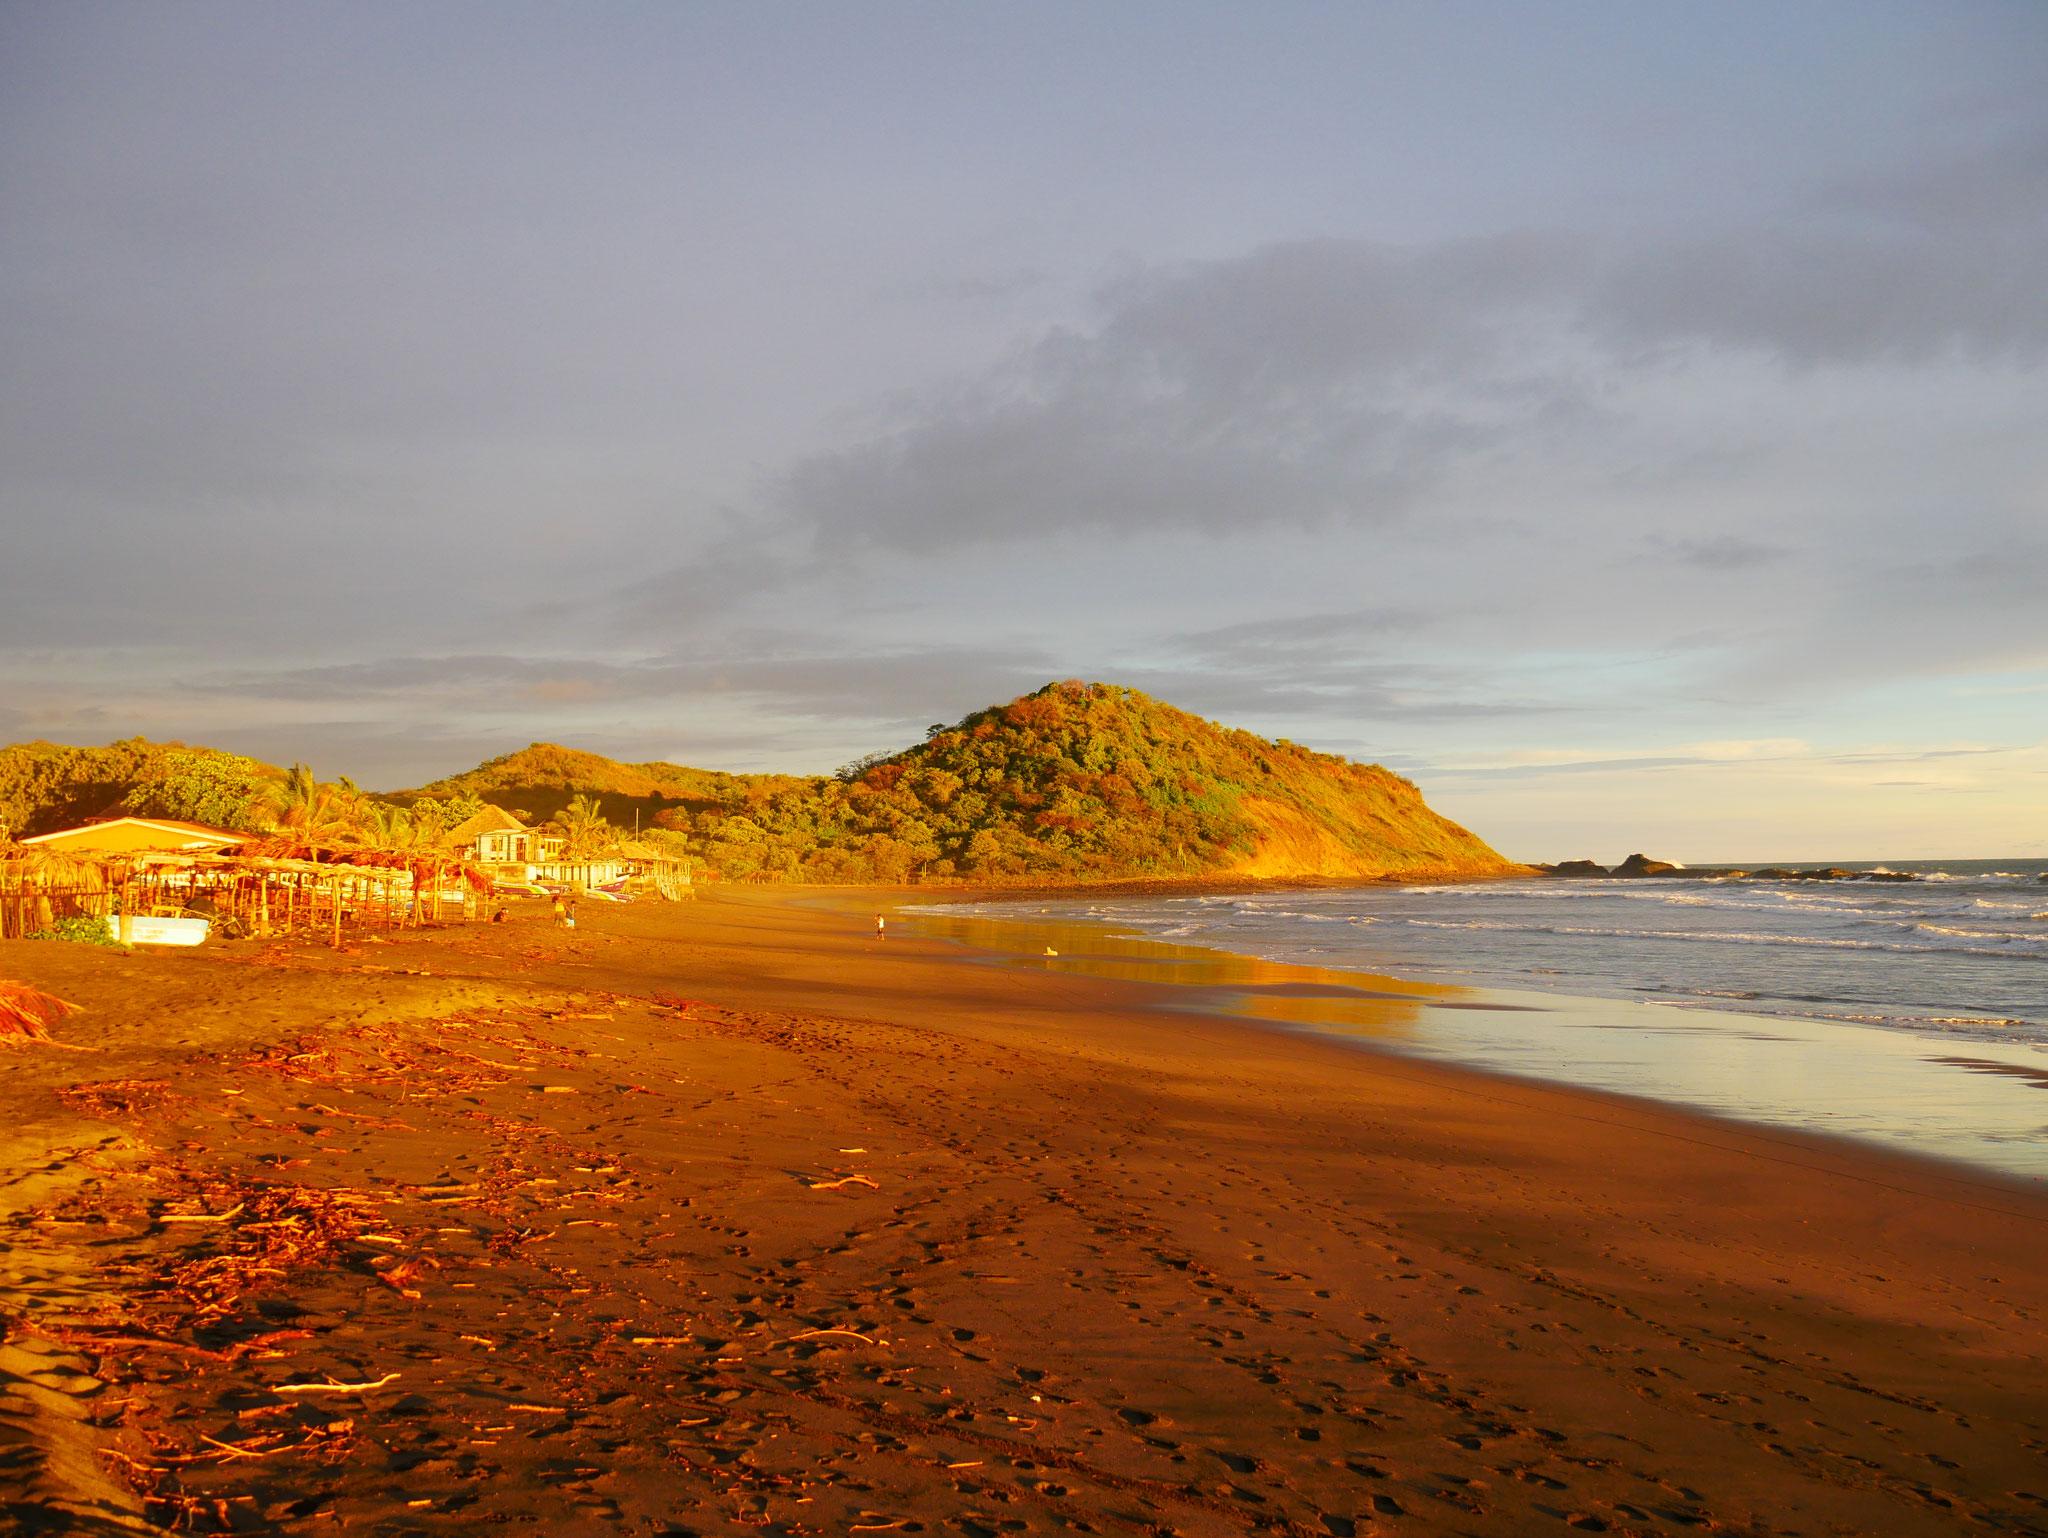 Playa El Transito, Nicaragua